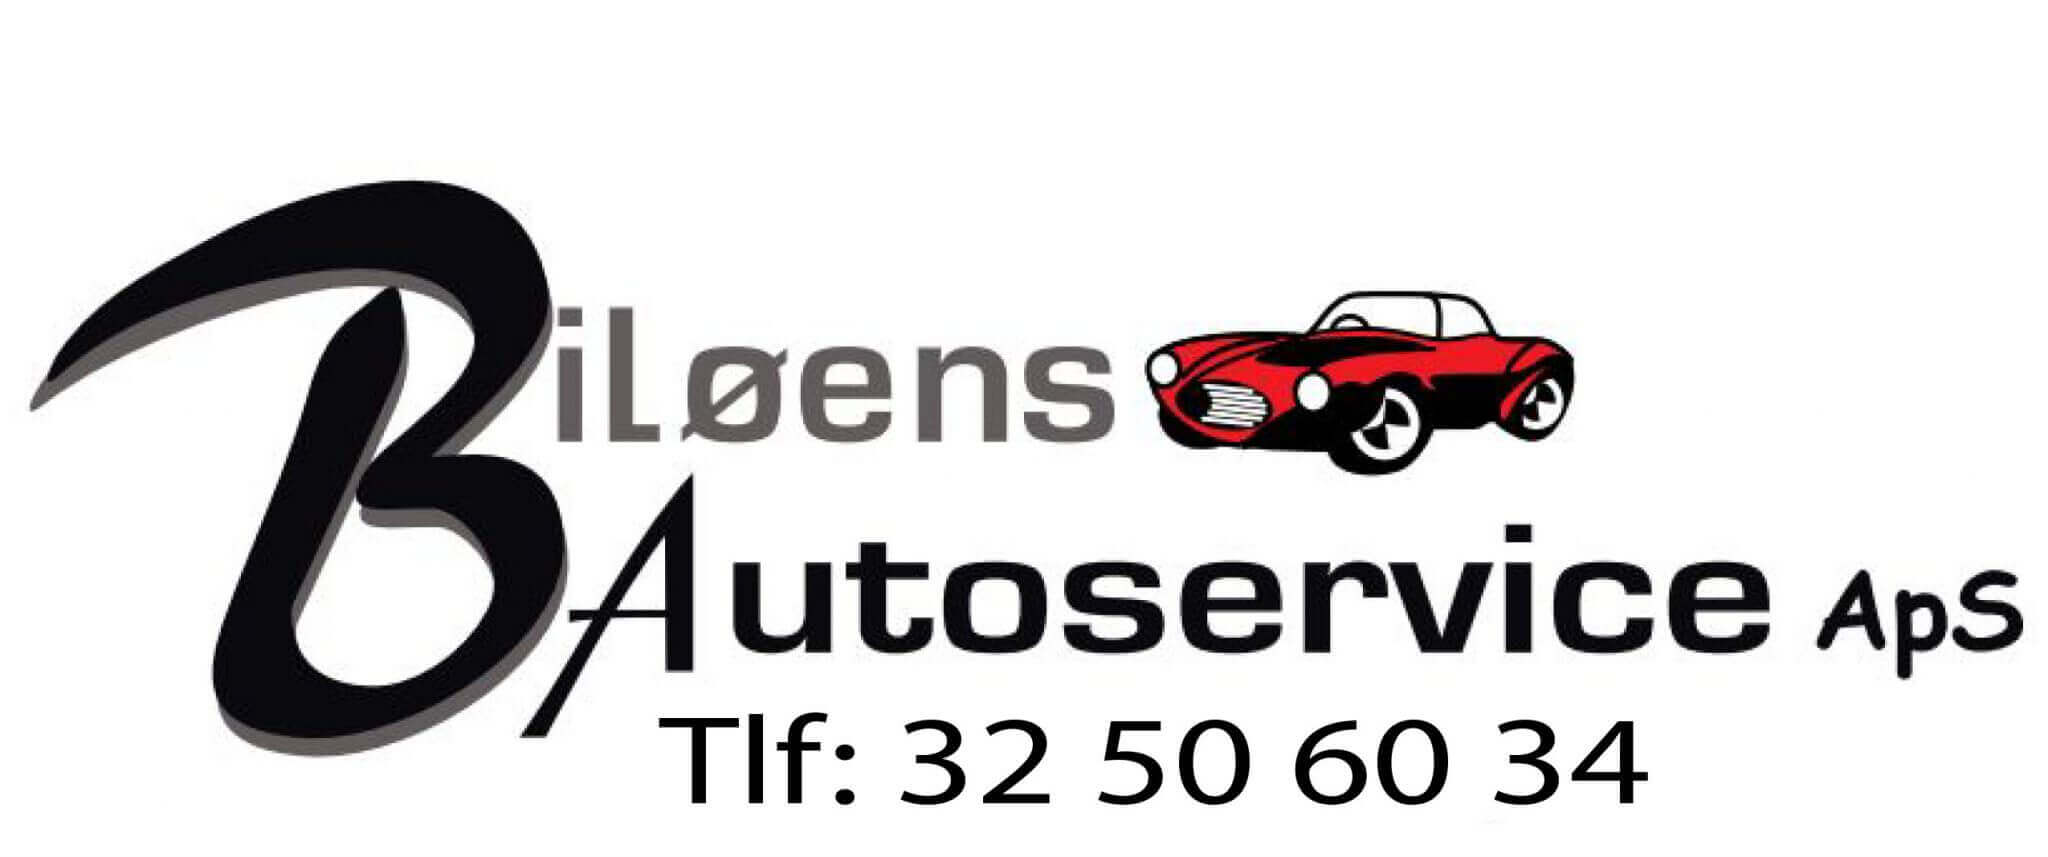 Autoværksted – Biløens Autoservice – www.biloens-autoservice.dk